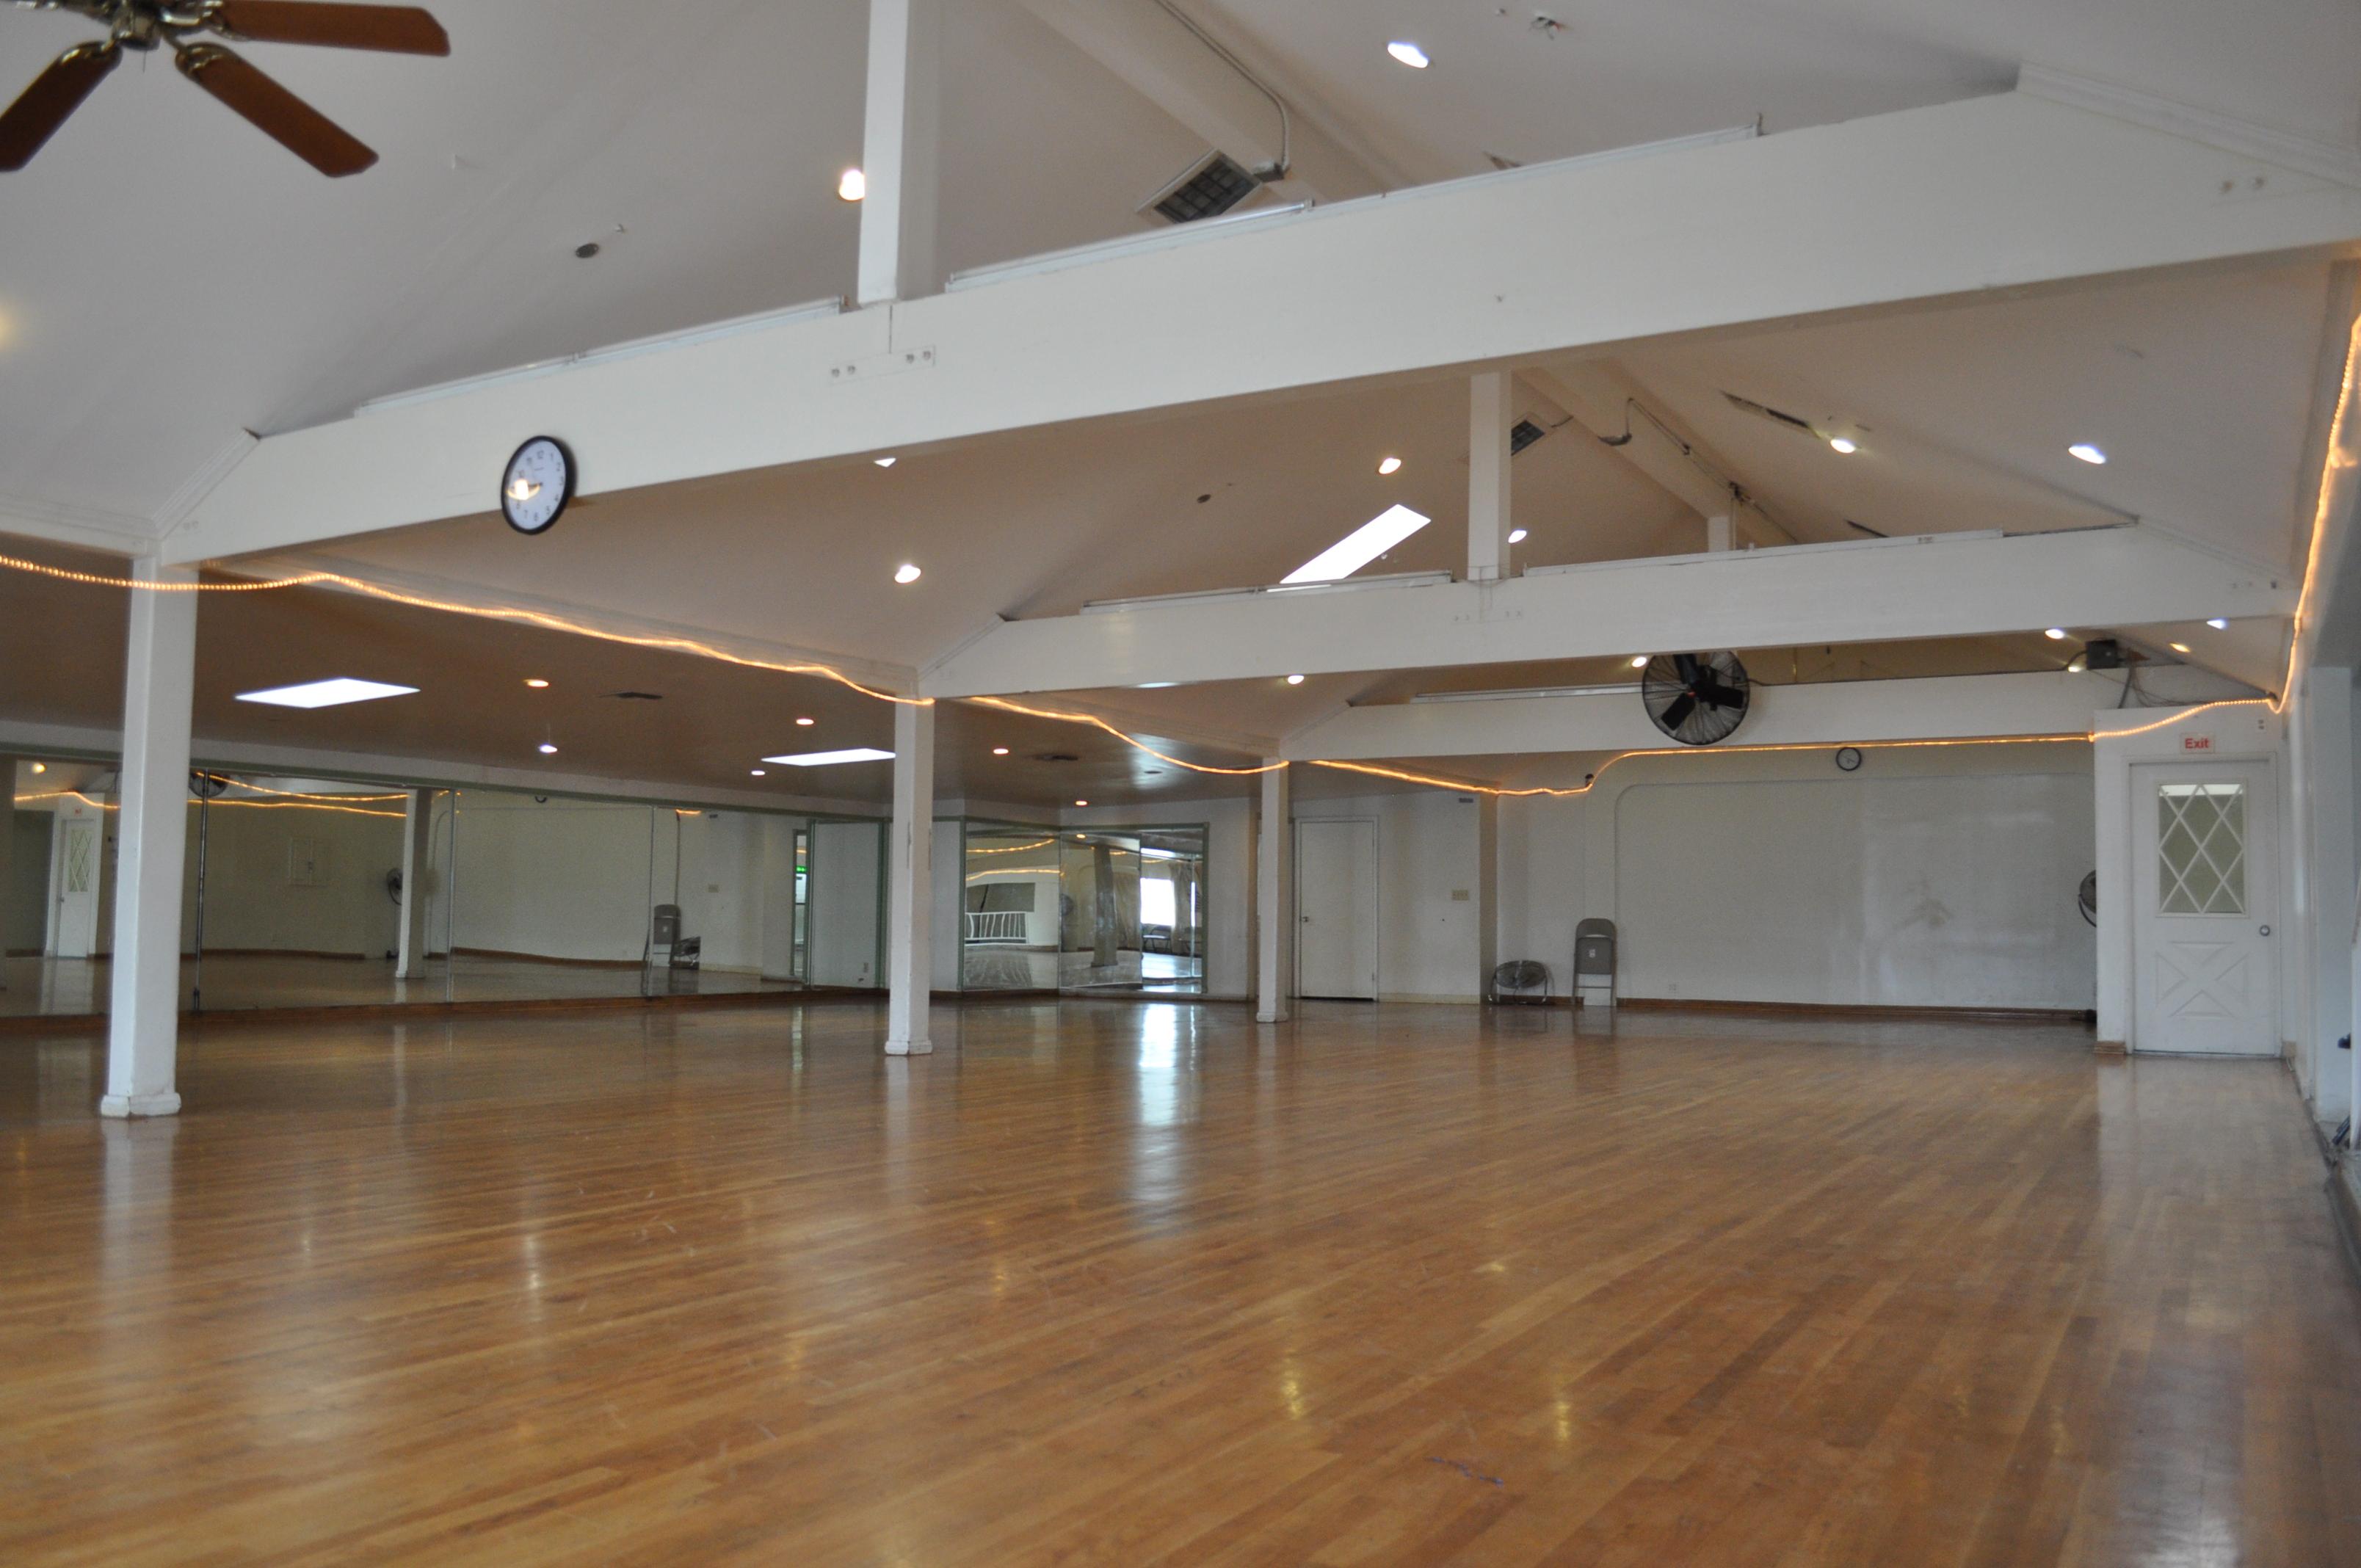 South Bay Dance Center 24817 Western Ave Lomita Ca 90717